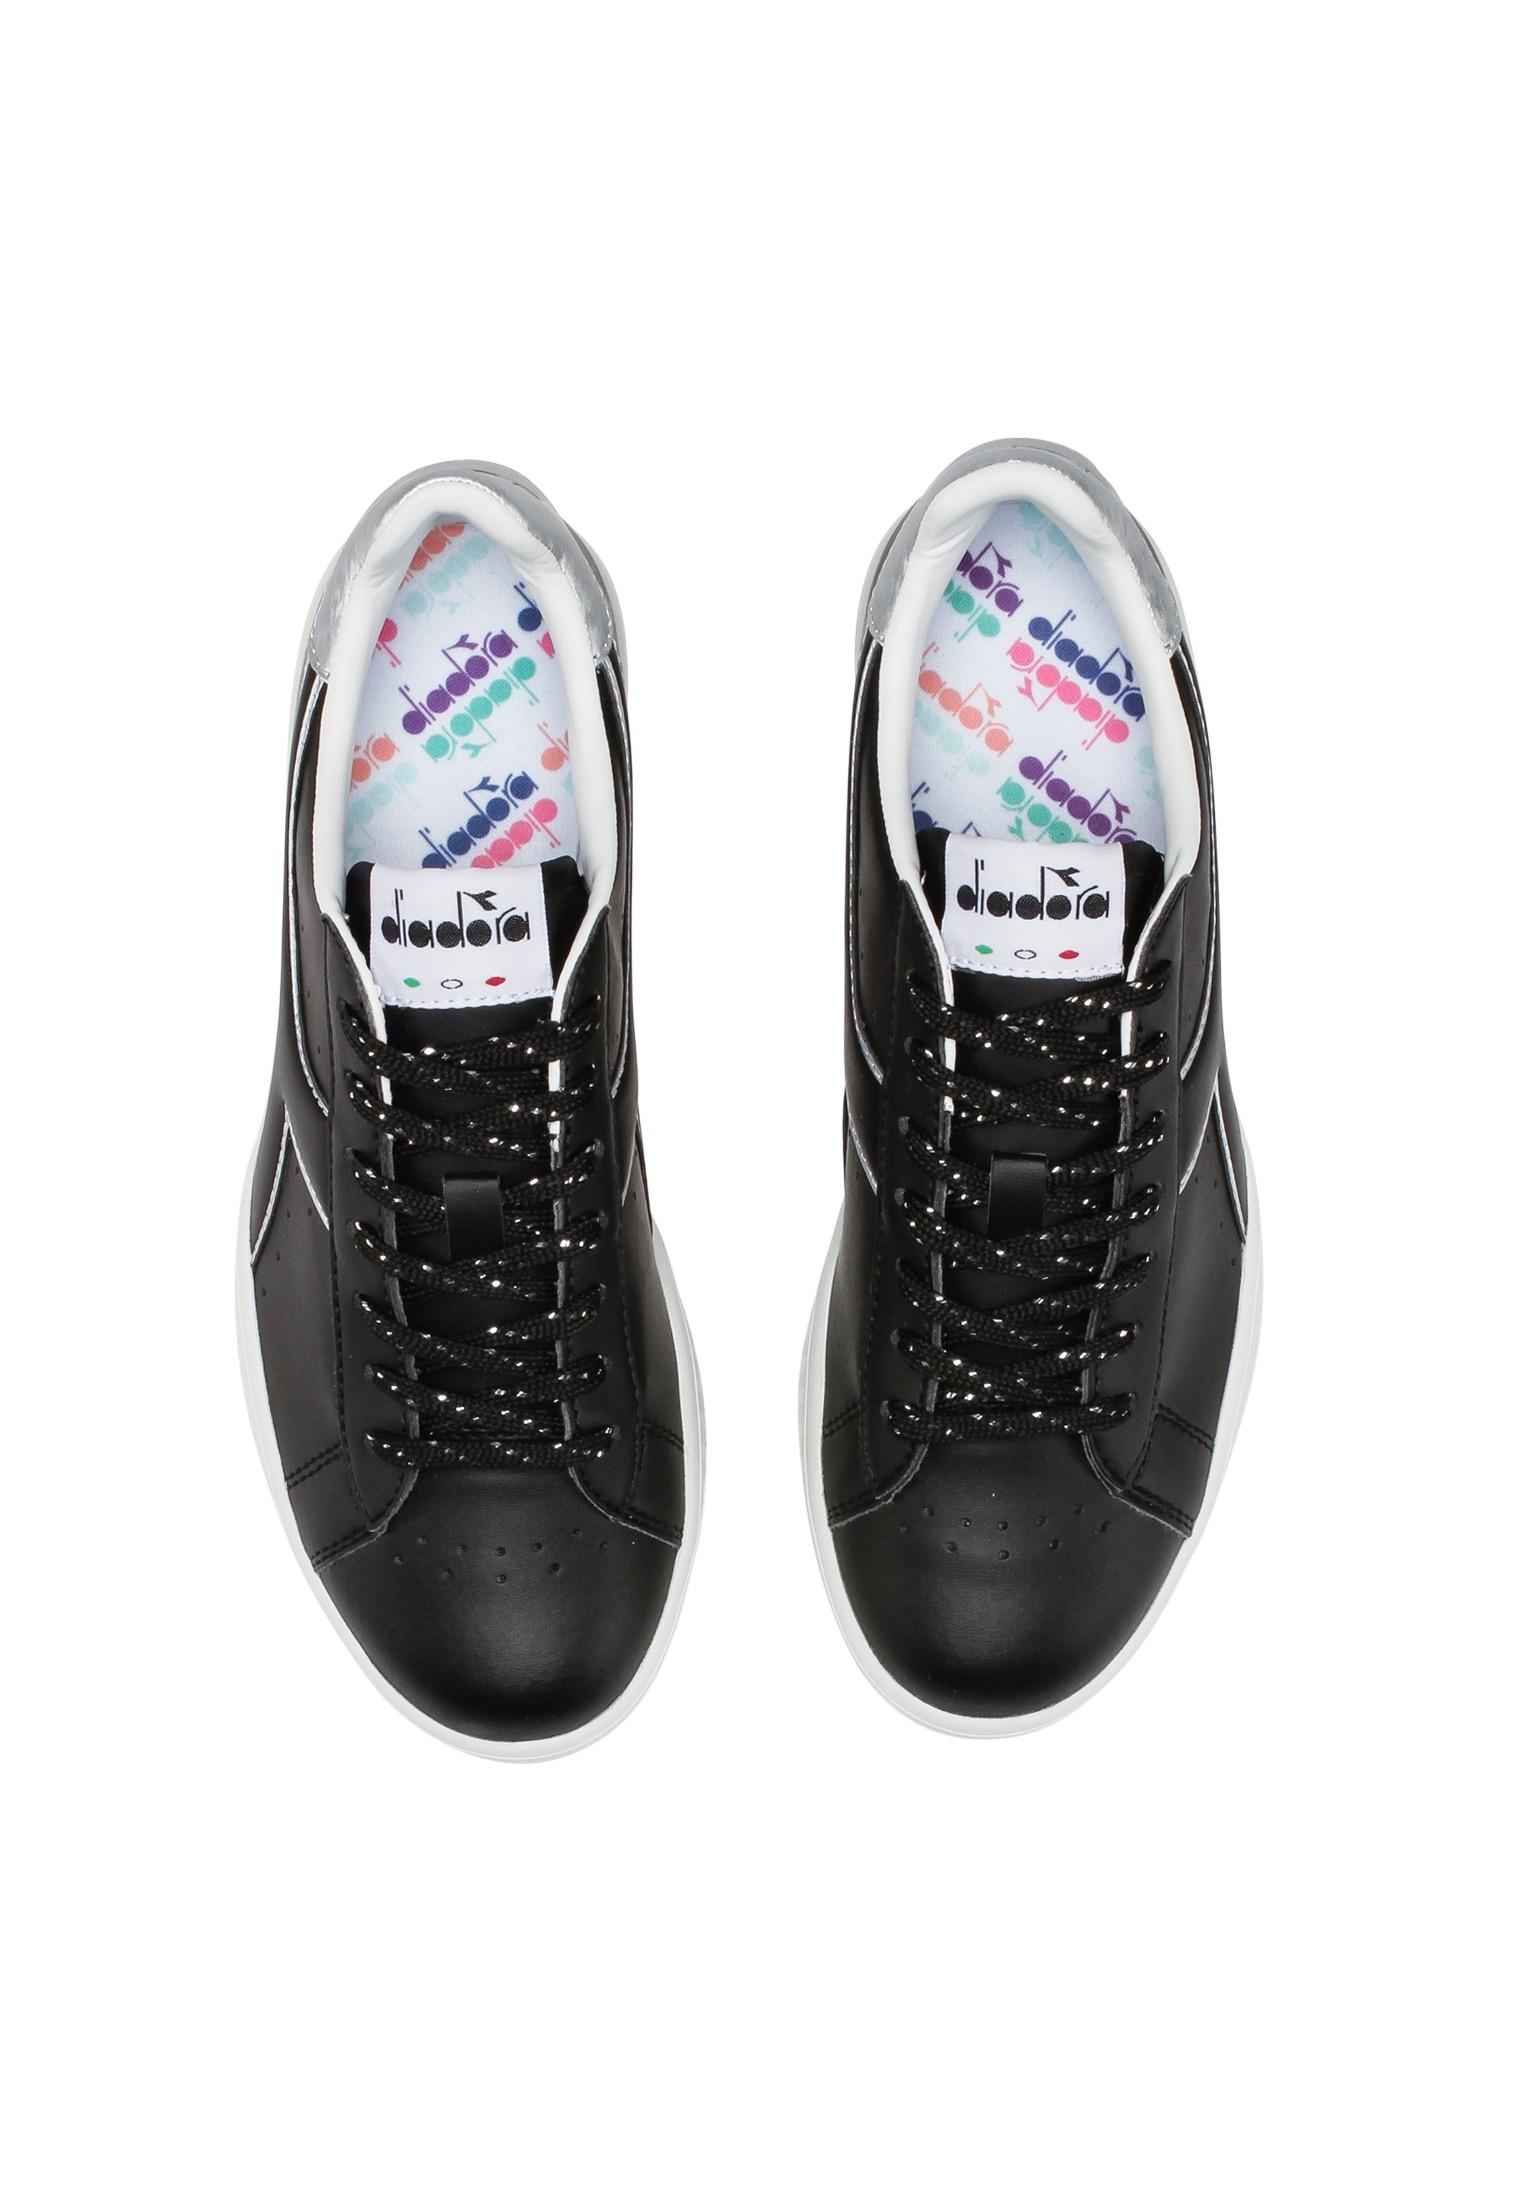 Diadora-Sneakers-GAME-P-WN-para-hombre-y-mujer miniatura 18